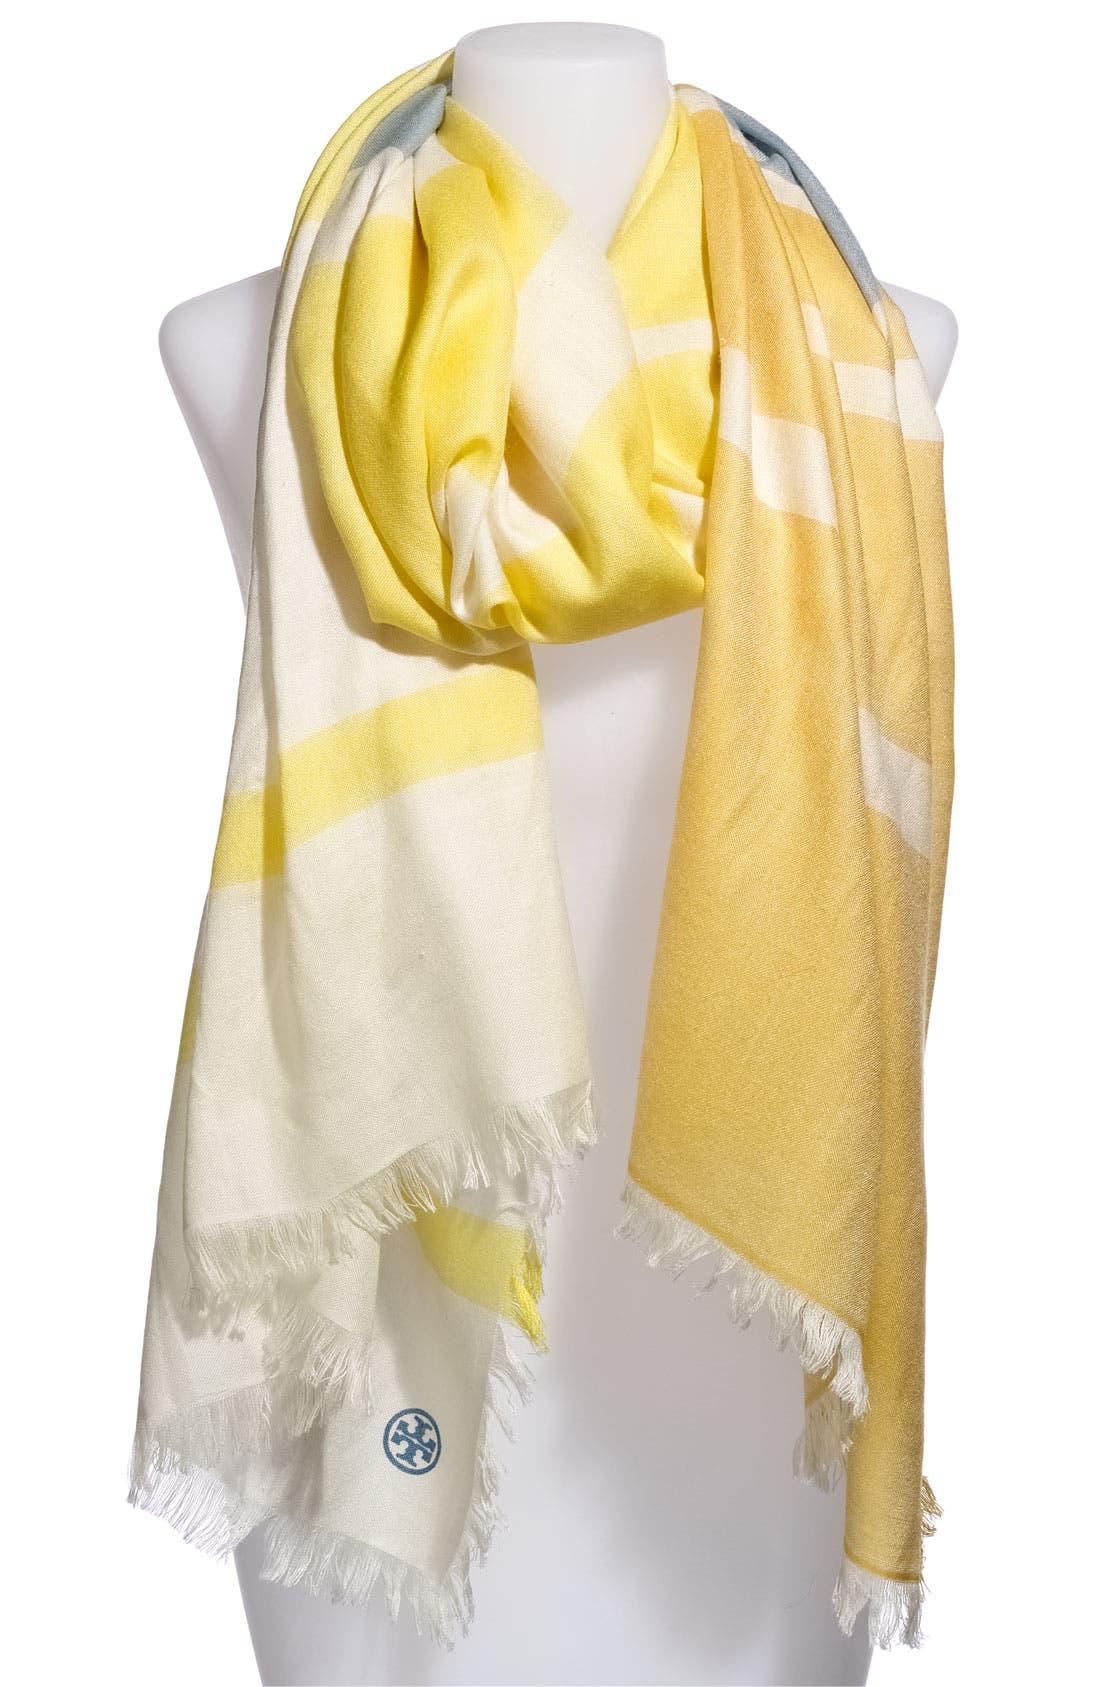 Alternate Image 1 Selected - Tory Burch Wool & Silk Scarf